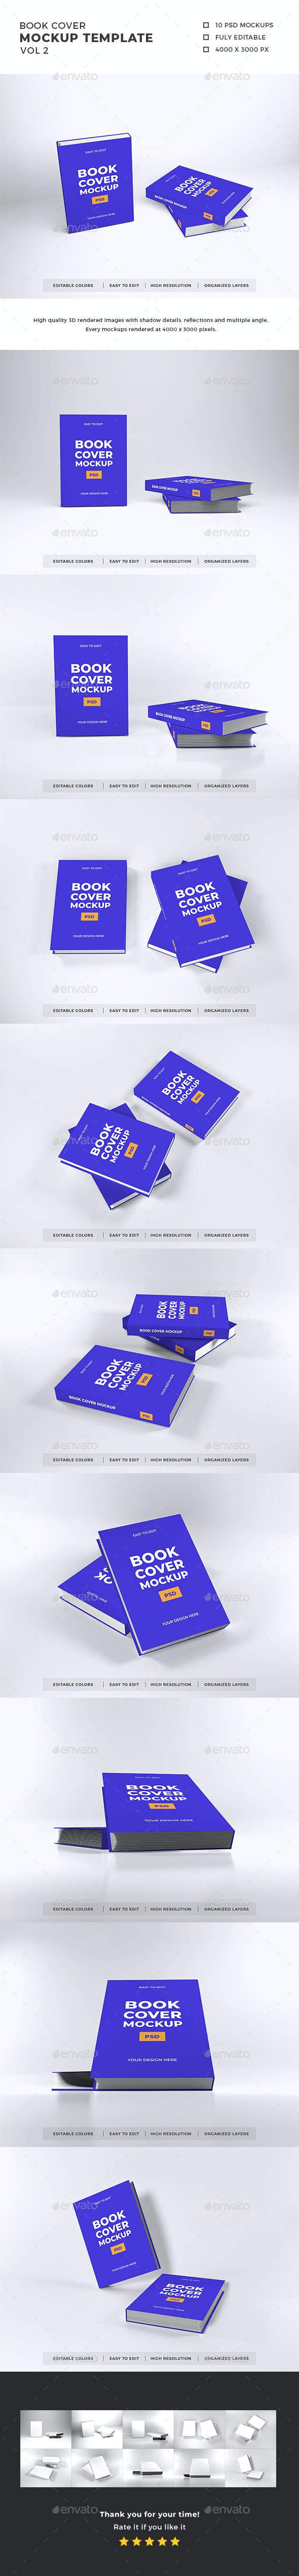 Book Cover Mockup Template Vol 2 - Books Print